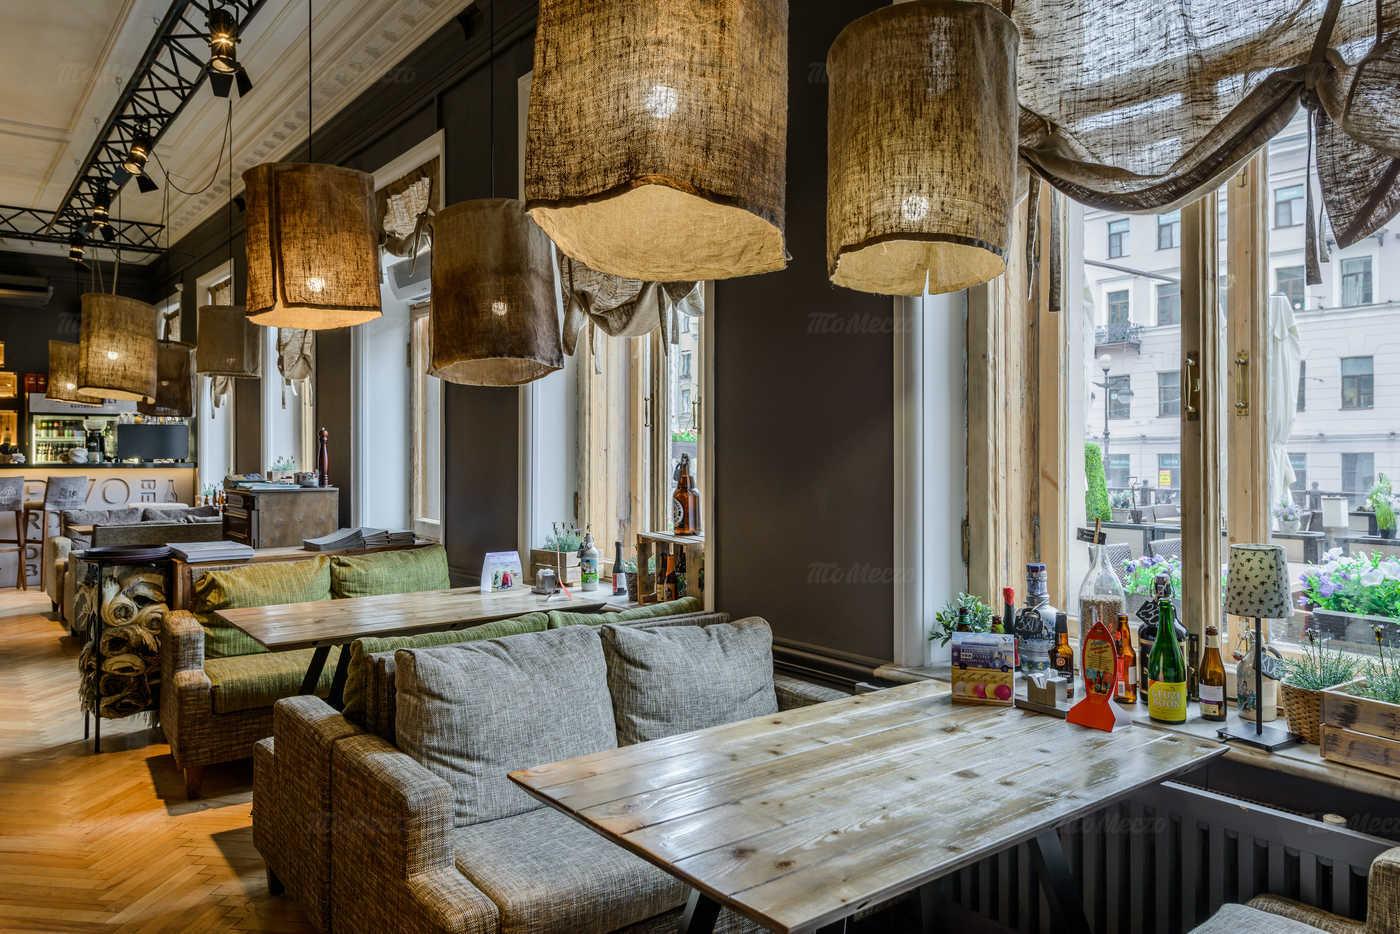 Ресторан Шато Винтаж (Chateau Vintage) на Невском проспекте фото 18